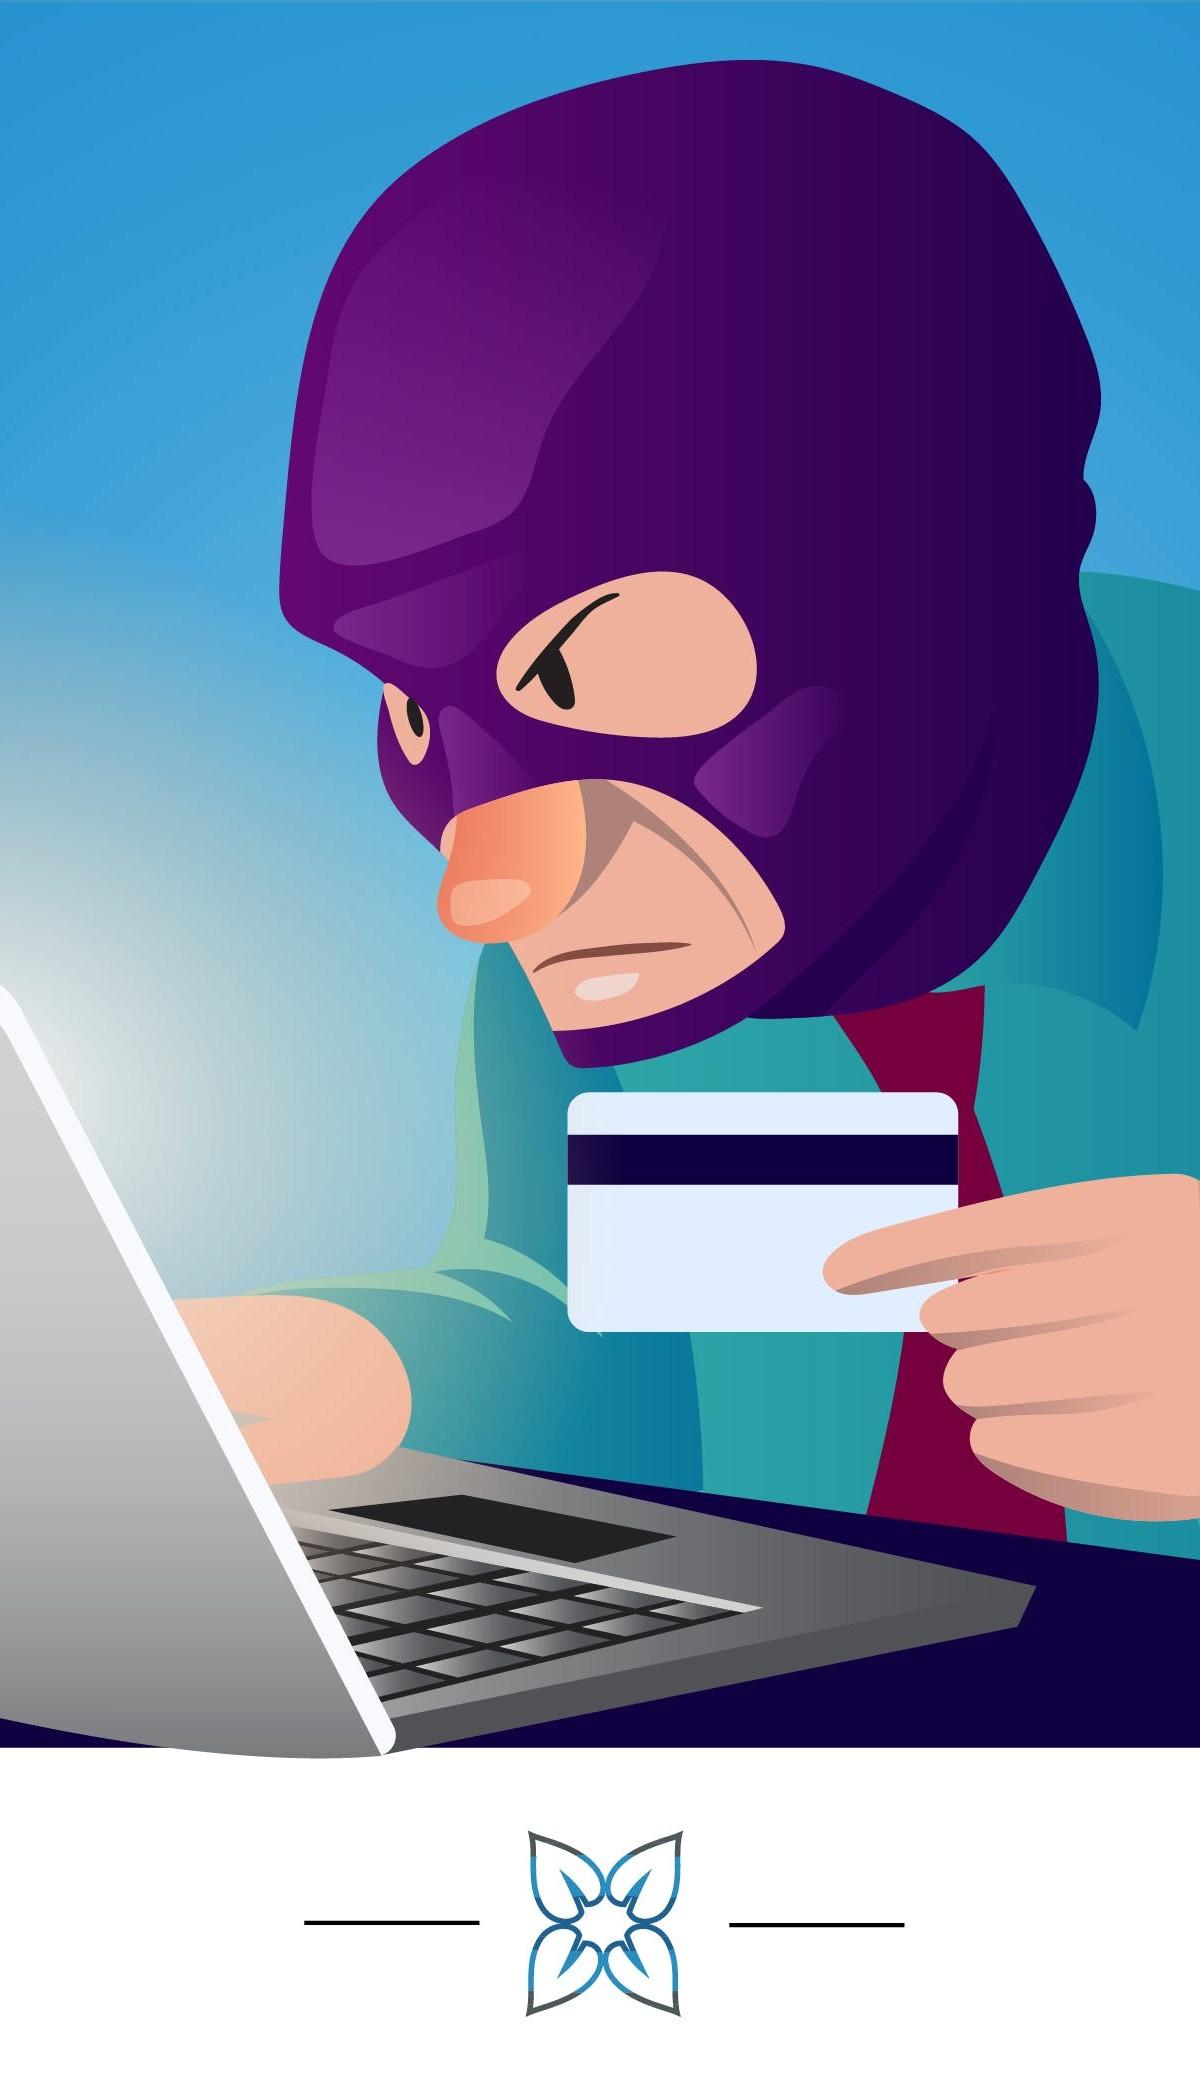 eP-sm-identity-theft-ver1.1-08-Jun-17-in-01